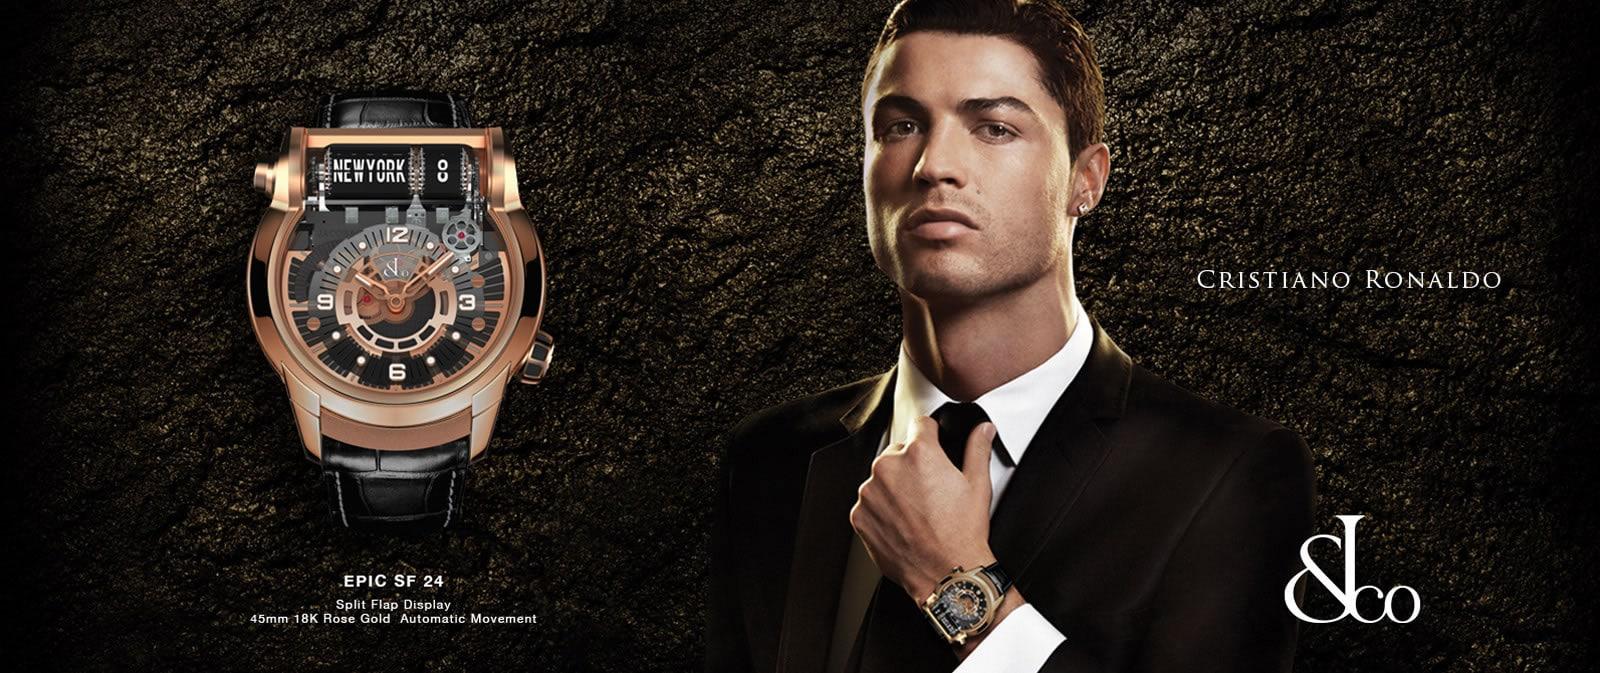 Cristiano Ronaldo Uhr